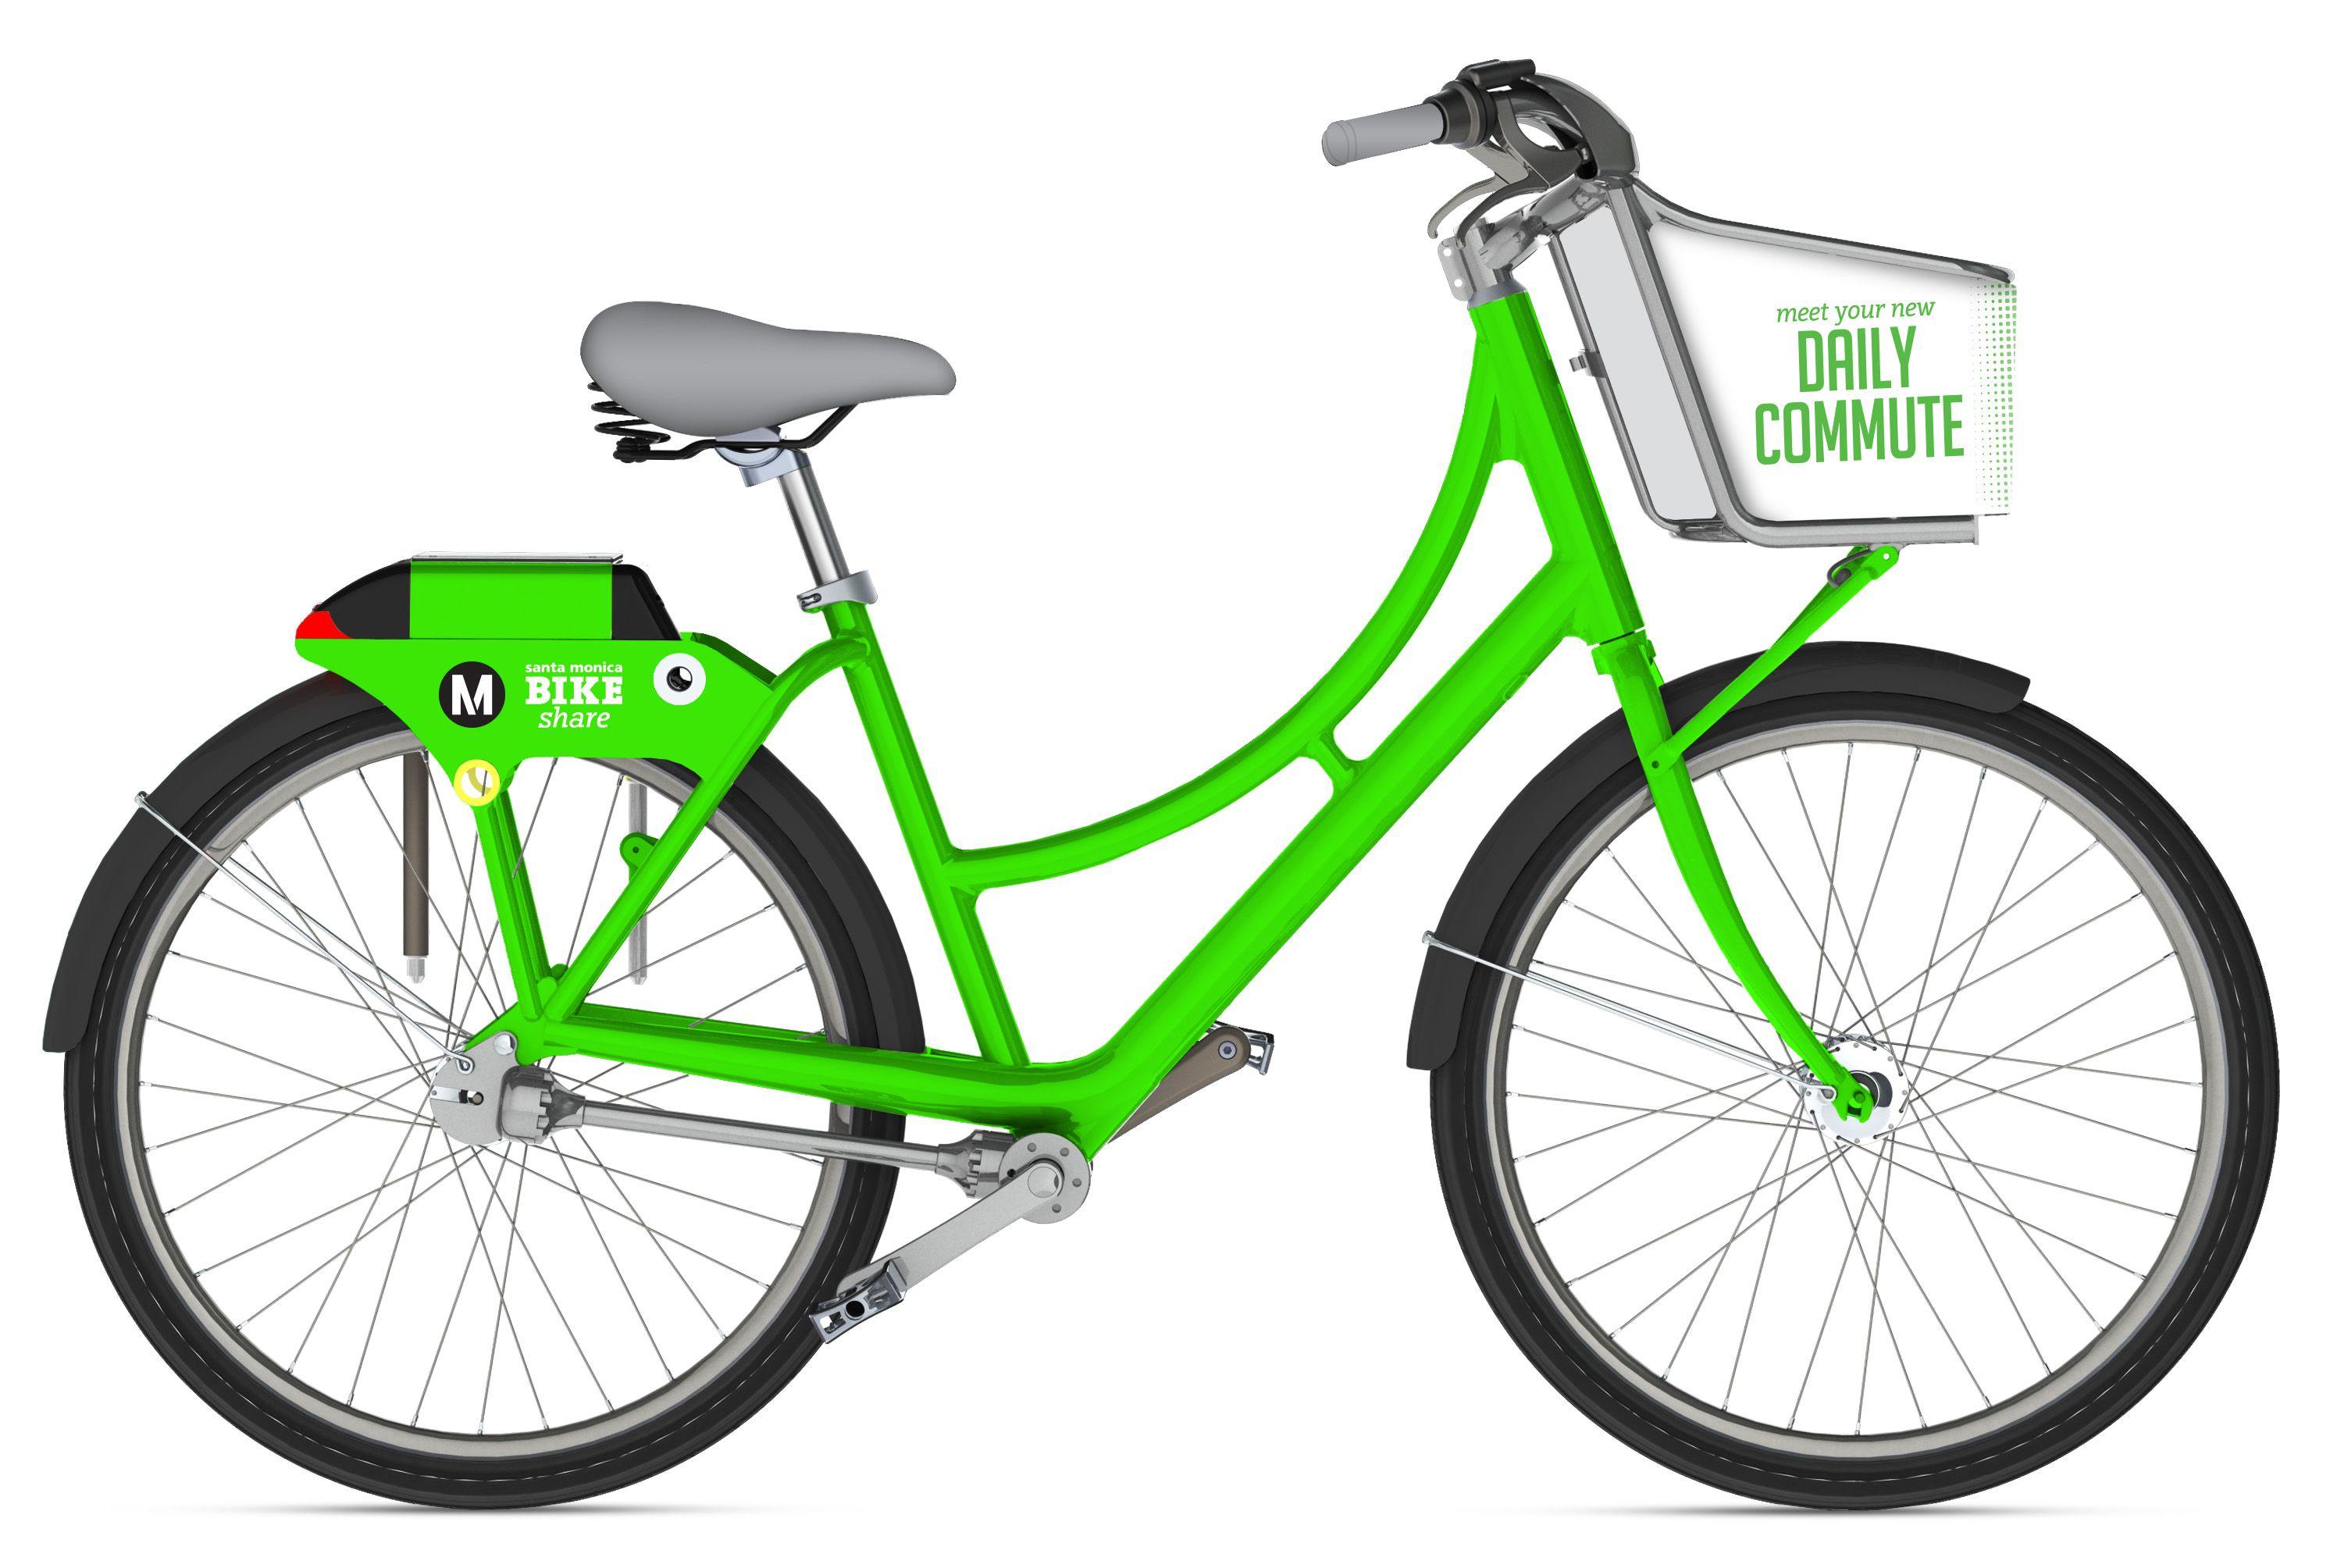 Bike share coming to santa monica bike share bike